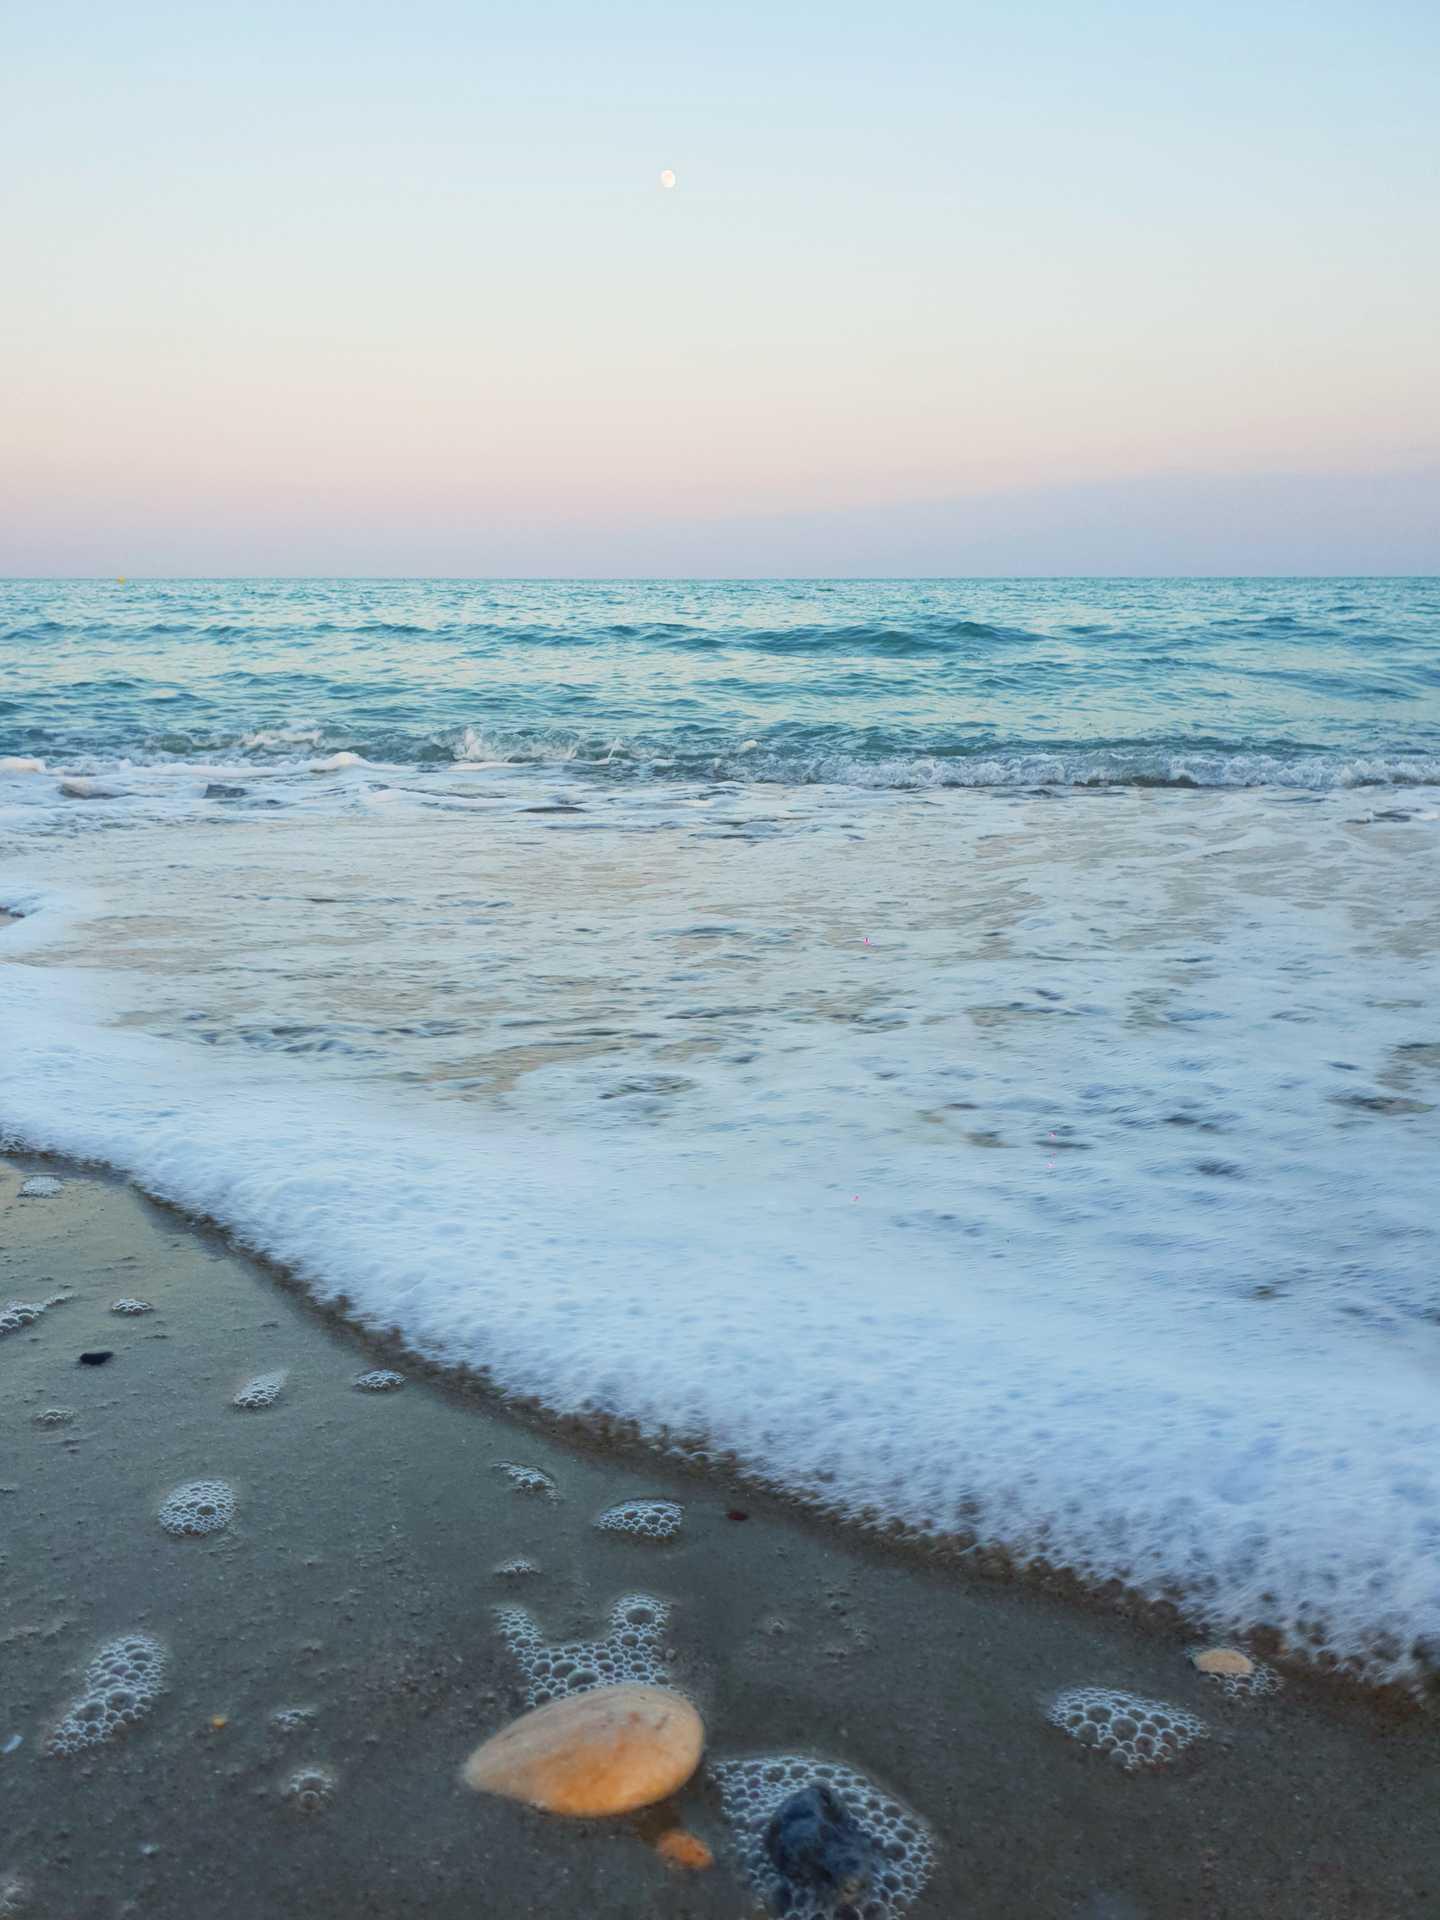 Pedra-Roja Beach